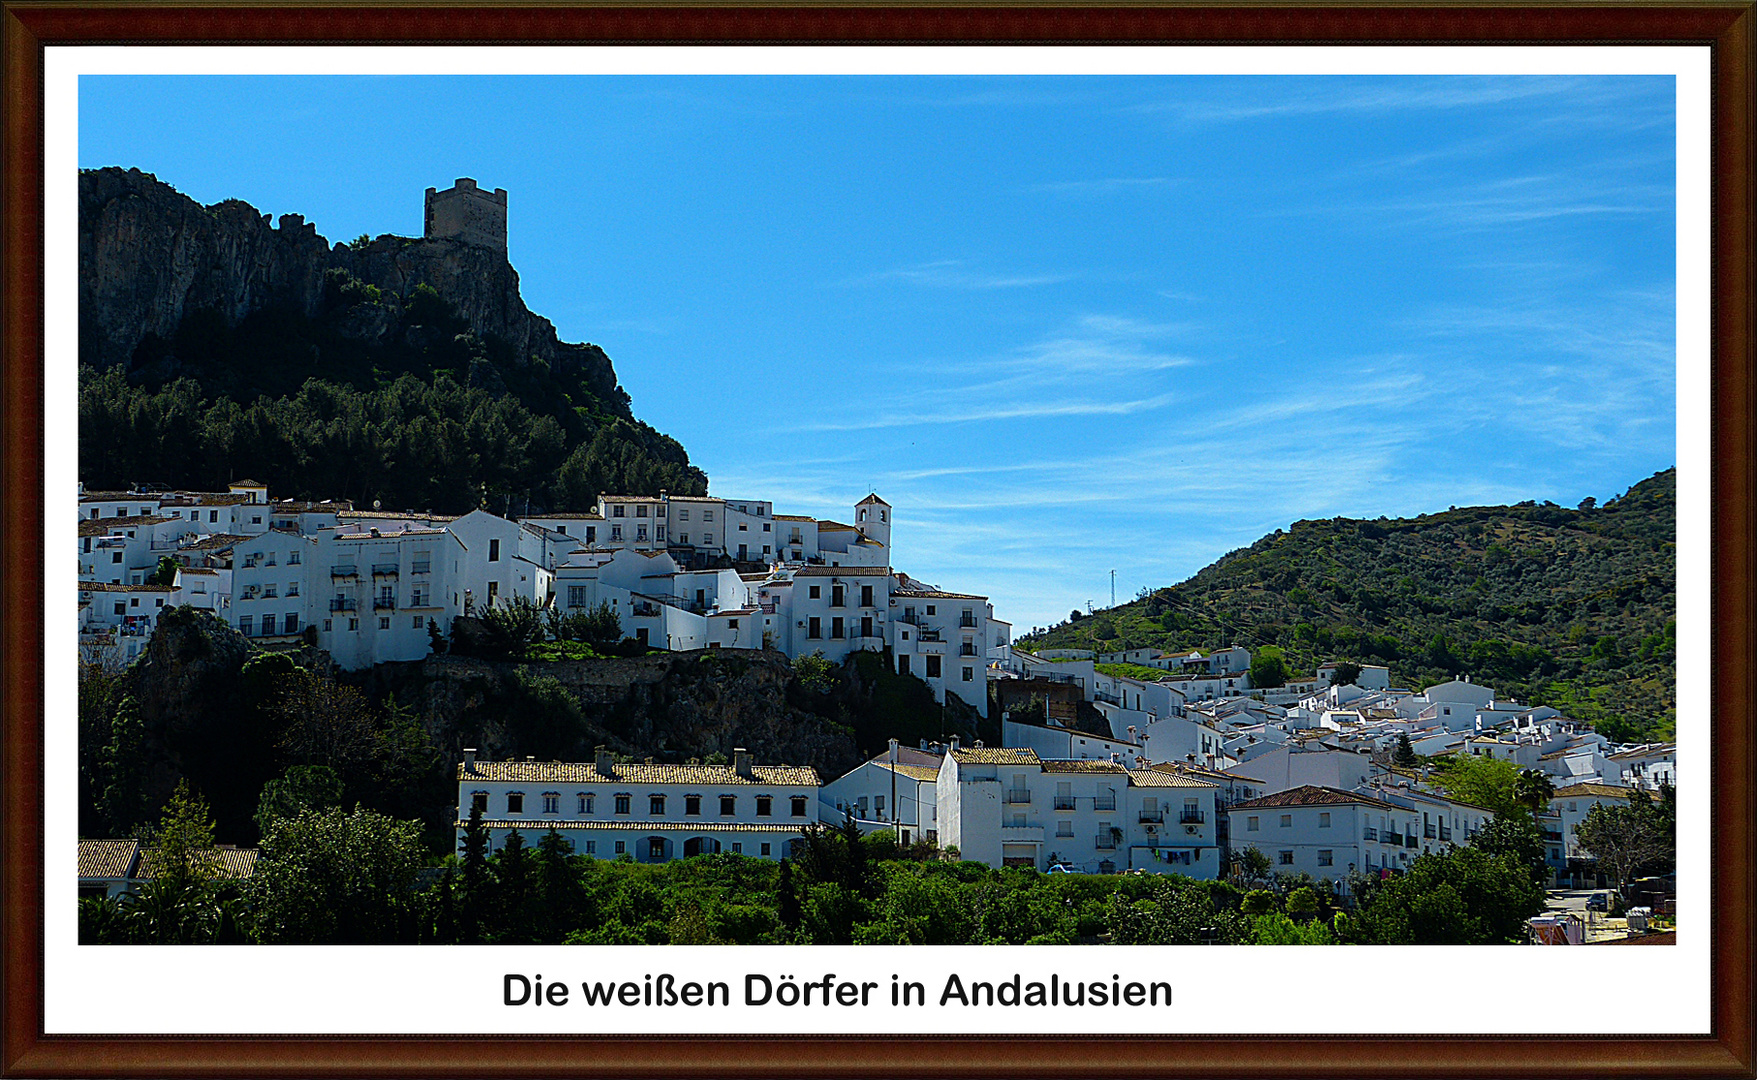 Die weißen Dörfer in Andalusien